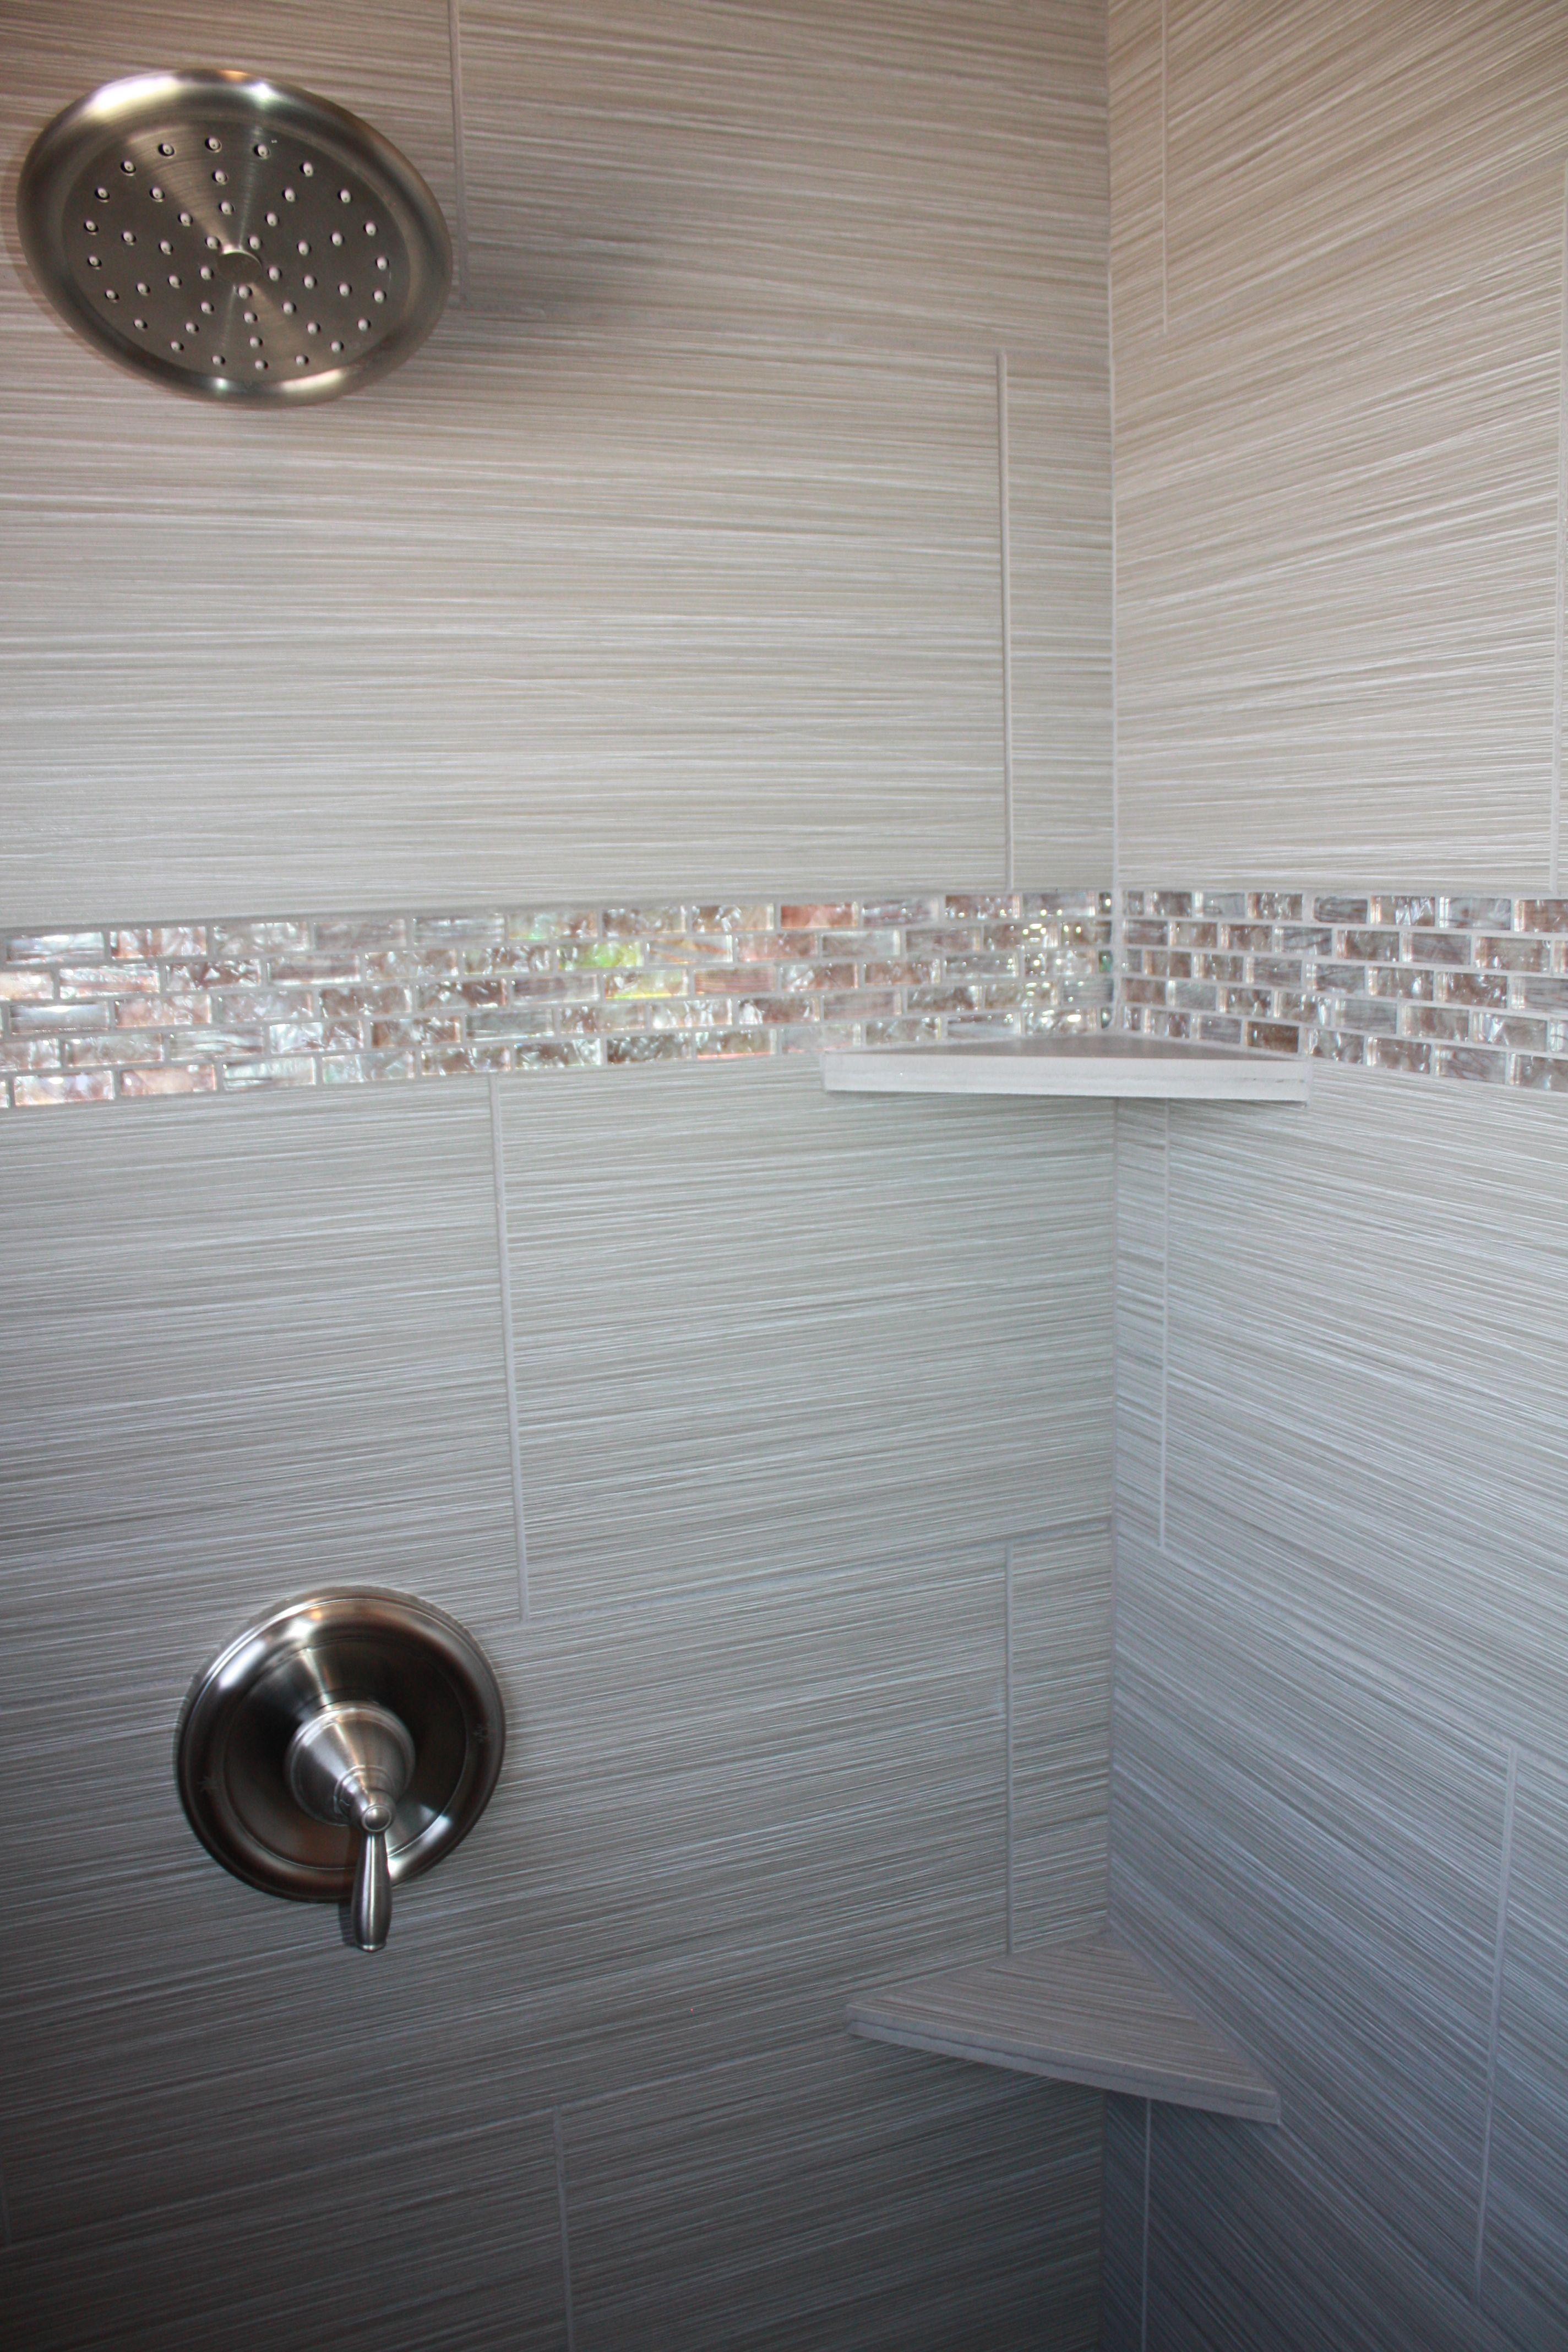 Best Kitchen Gallery: Tile Design In Master Bathroom Shower Home Ideas Pinterest of Bathroom Tile Design  on rachelxblog.com